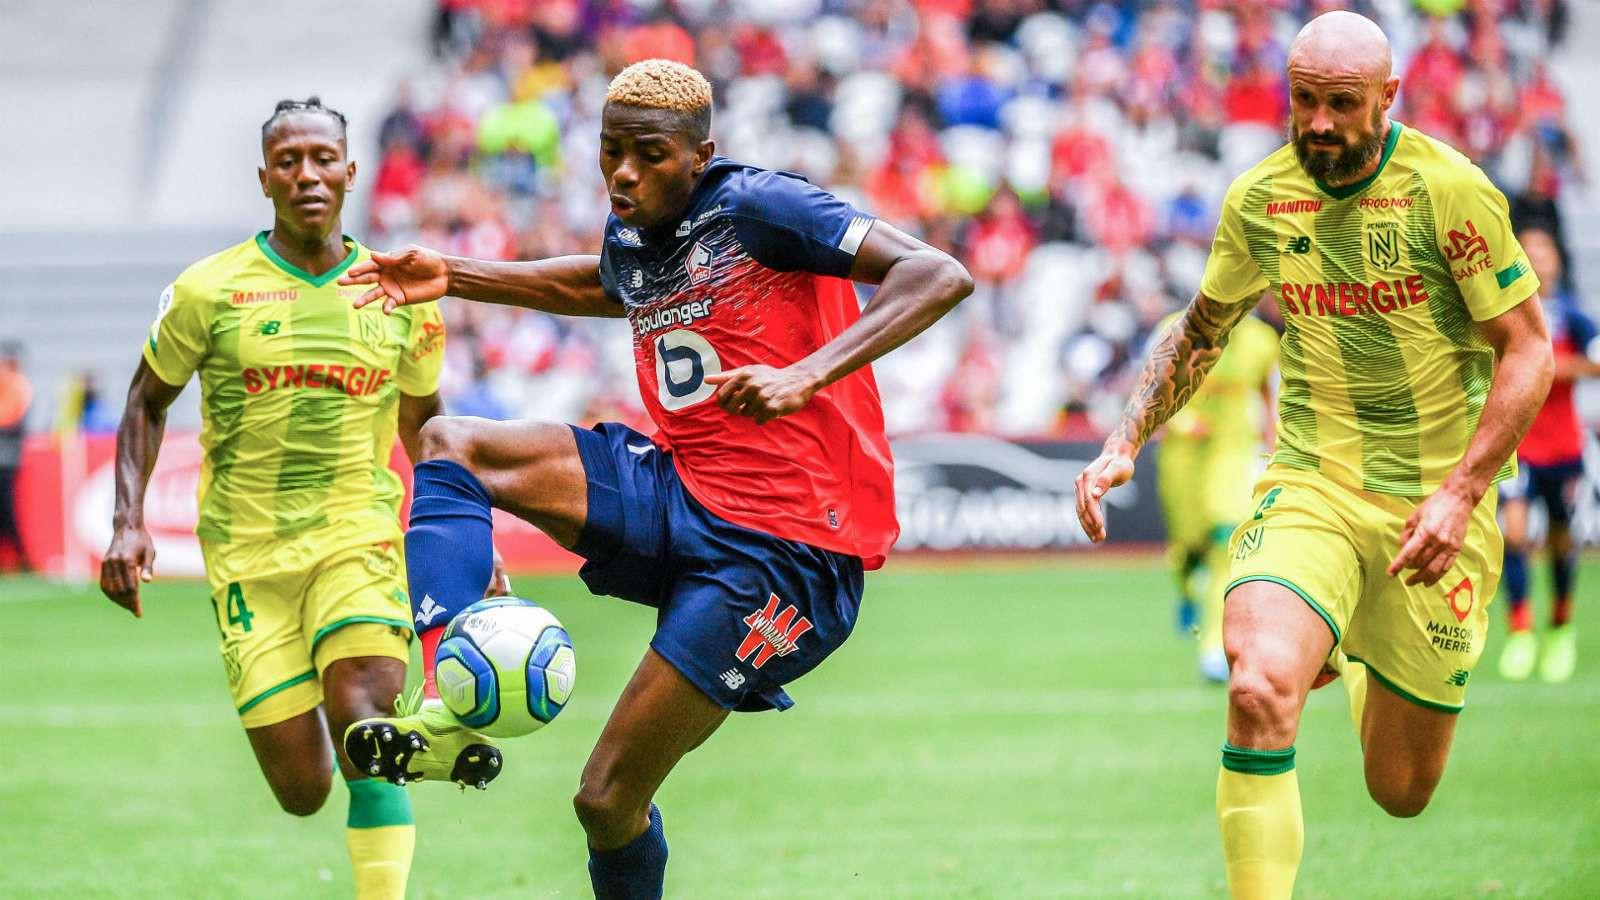 Victor Osimhen scores a brace on Lille debut against Nantes lindaikejisblog